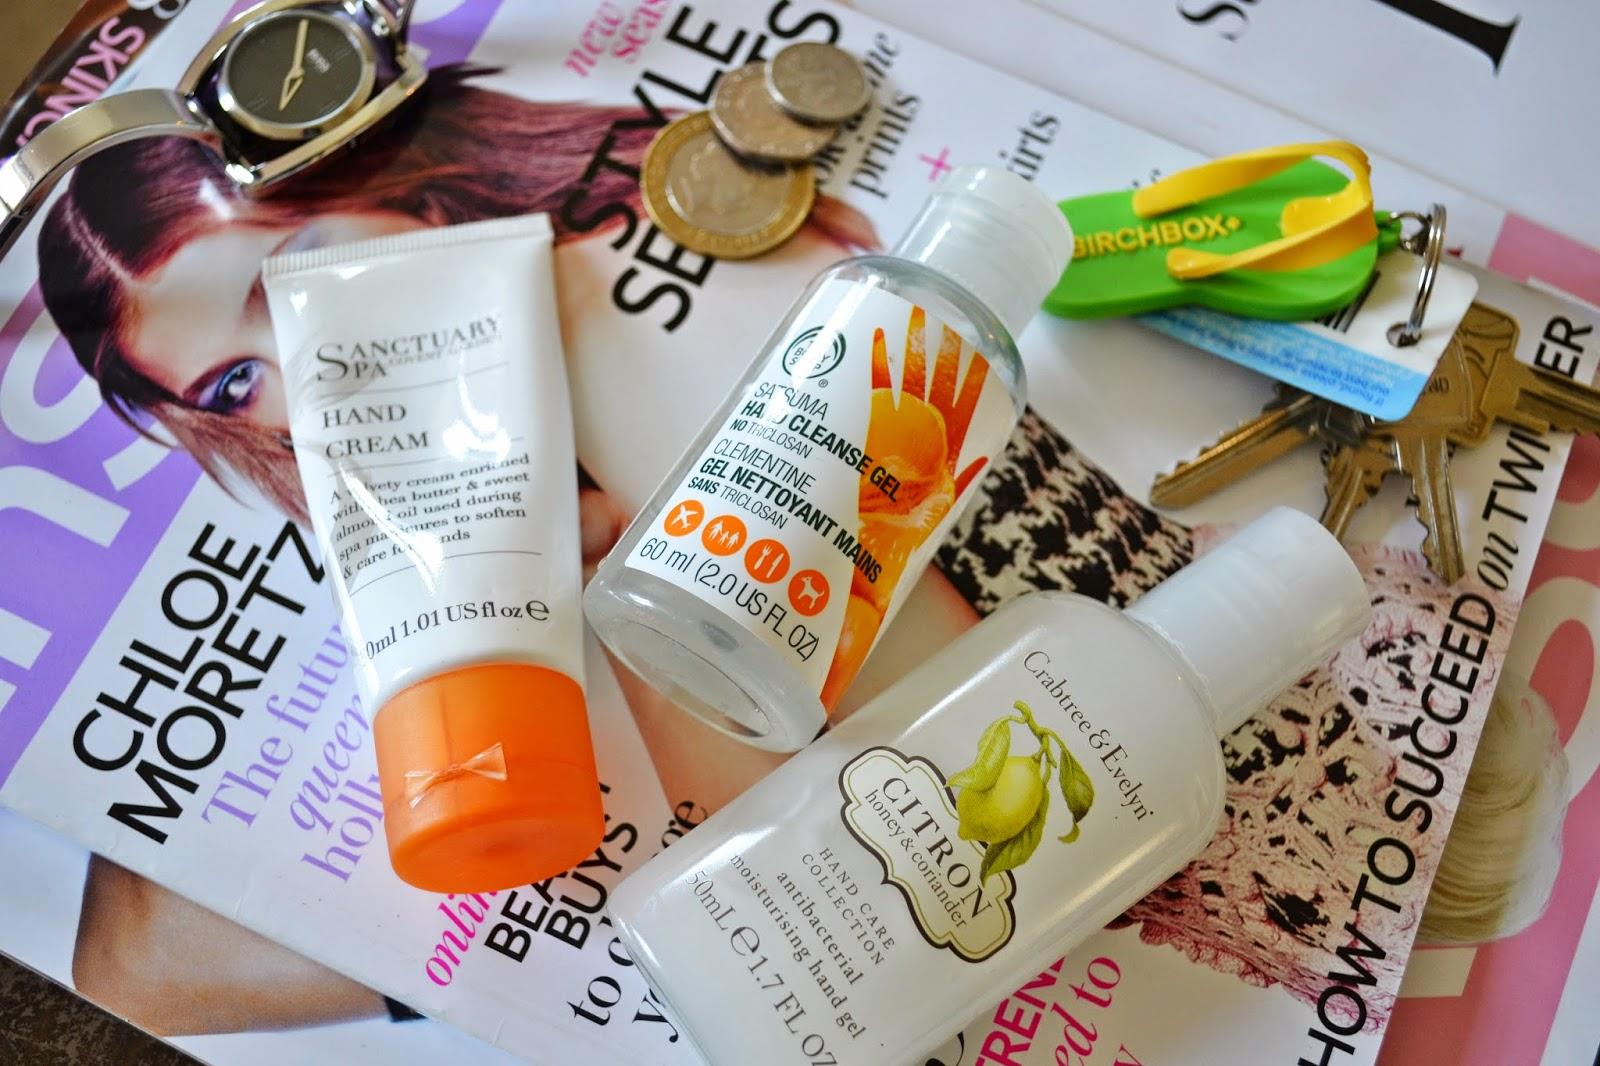 Hand Care ft Sanctuary Spa Hand Cream, Crabtree & Evelyn Antibacterial Gel, The Body Shop Hand Cleanse Gel - Aspiring Londoner